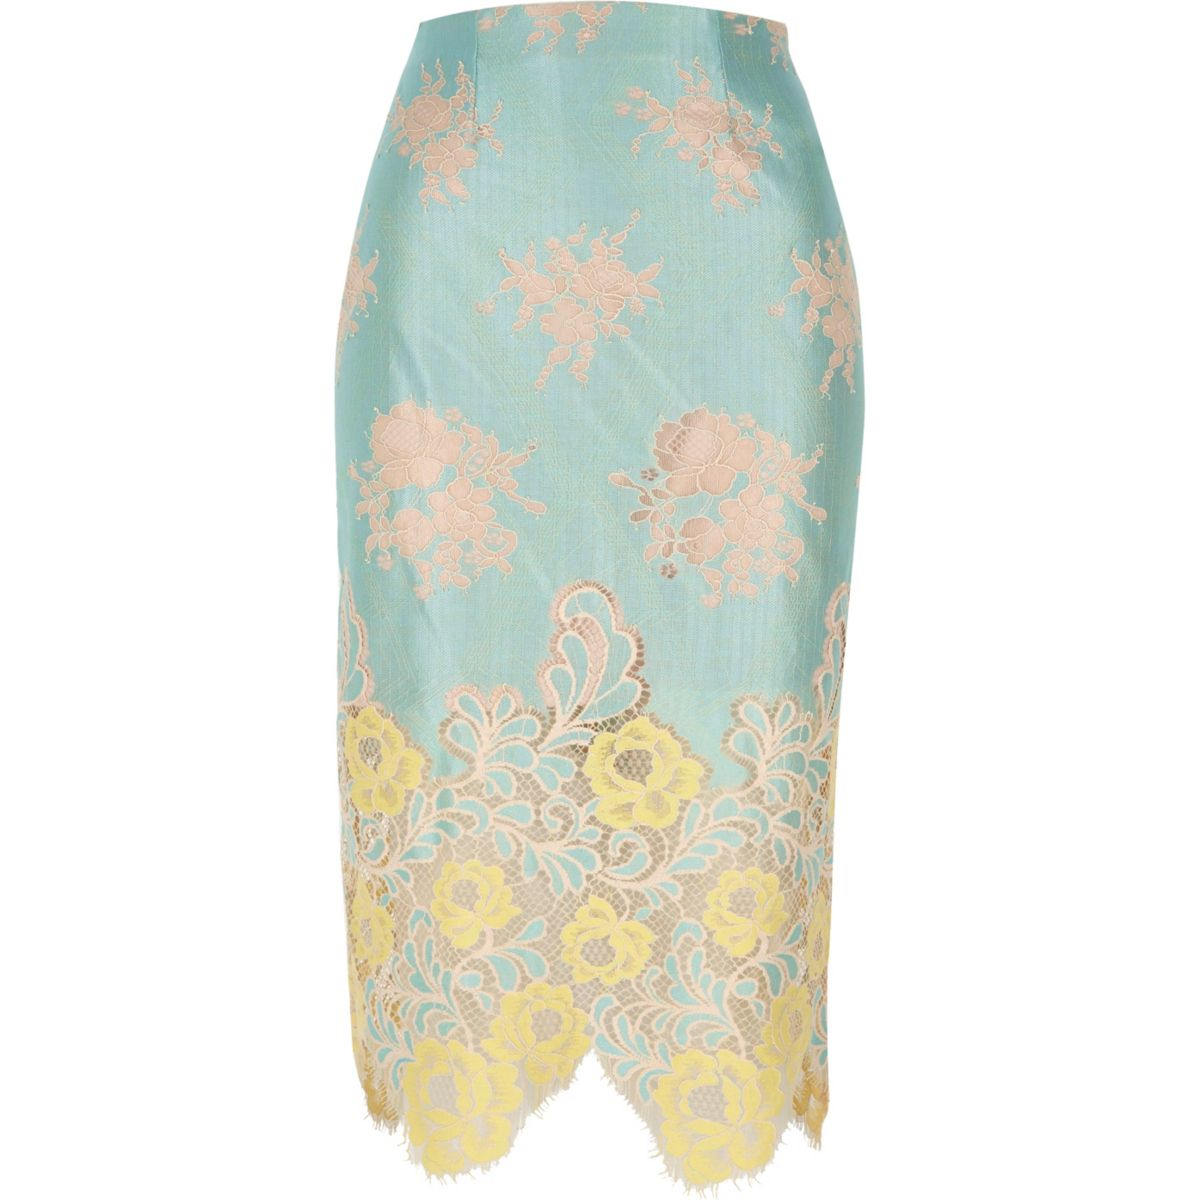 Light green lace midi pencil skirt